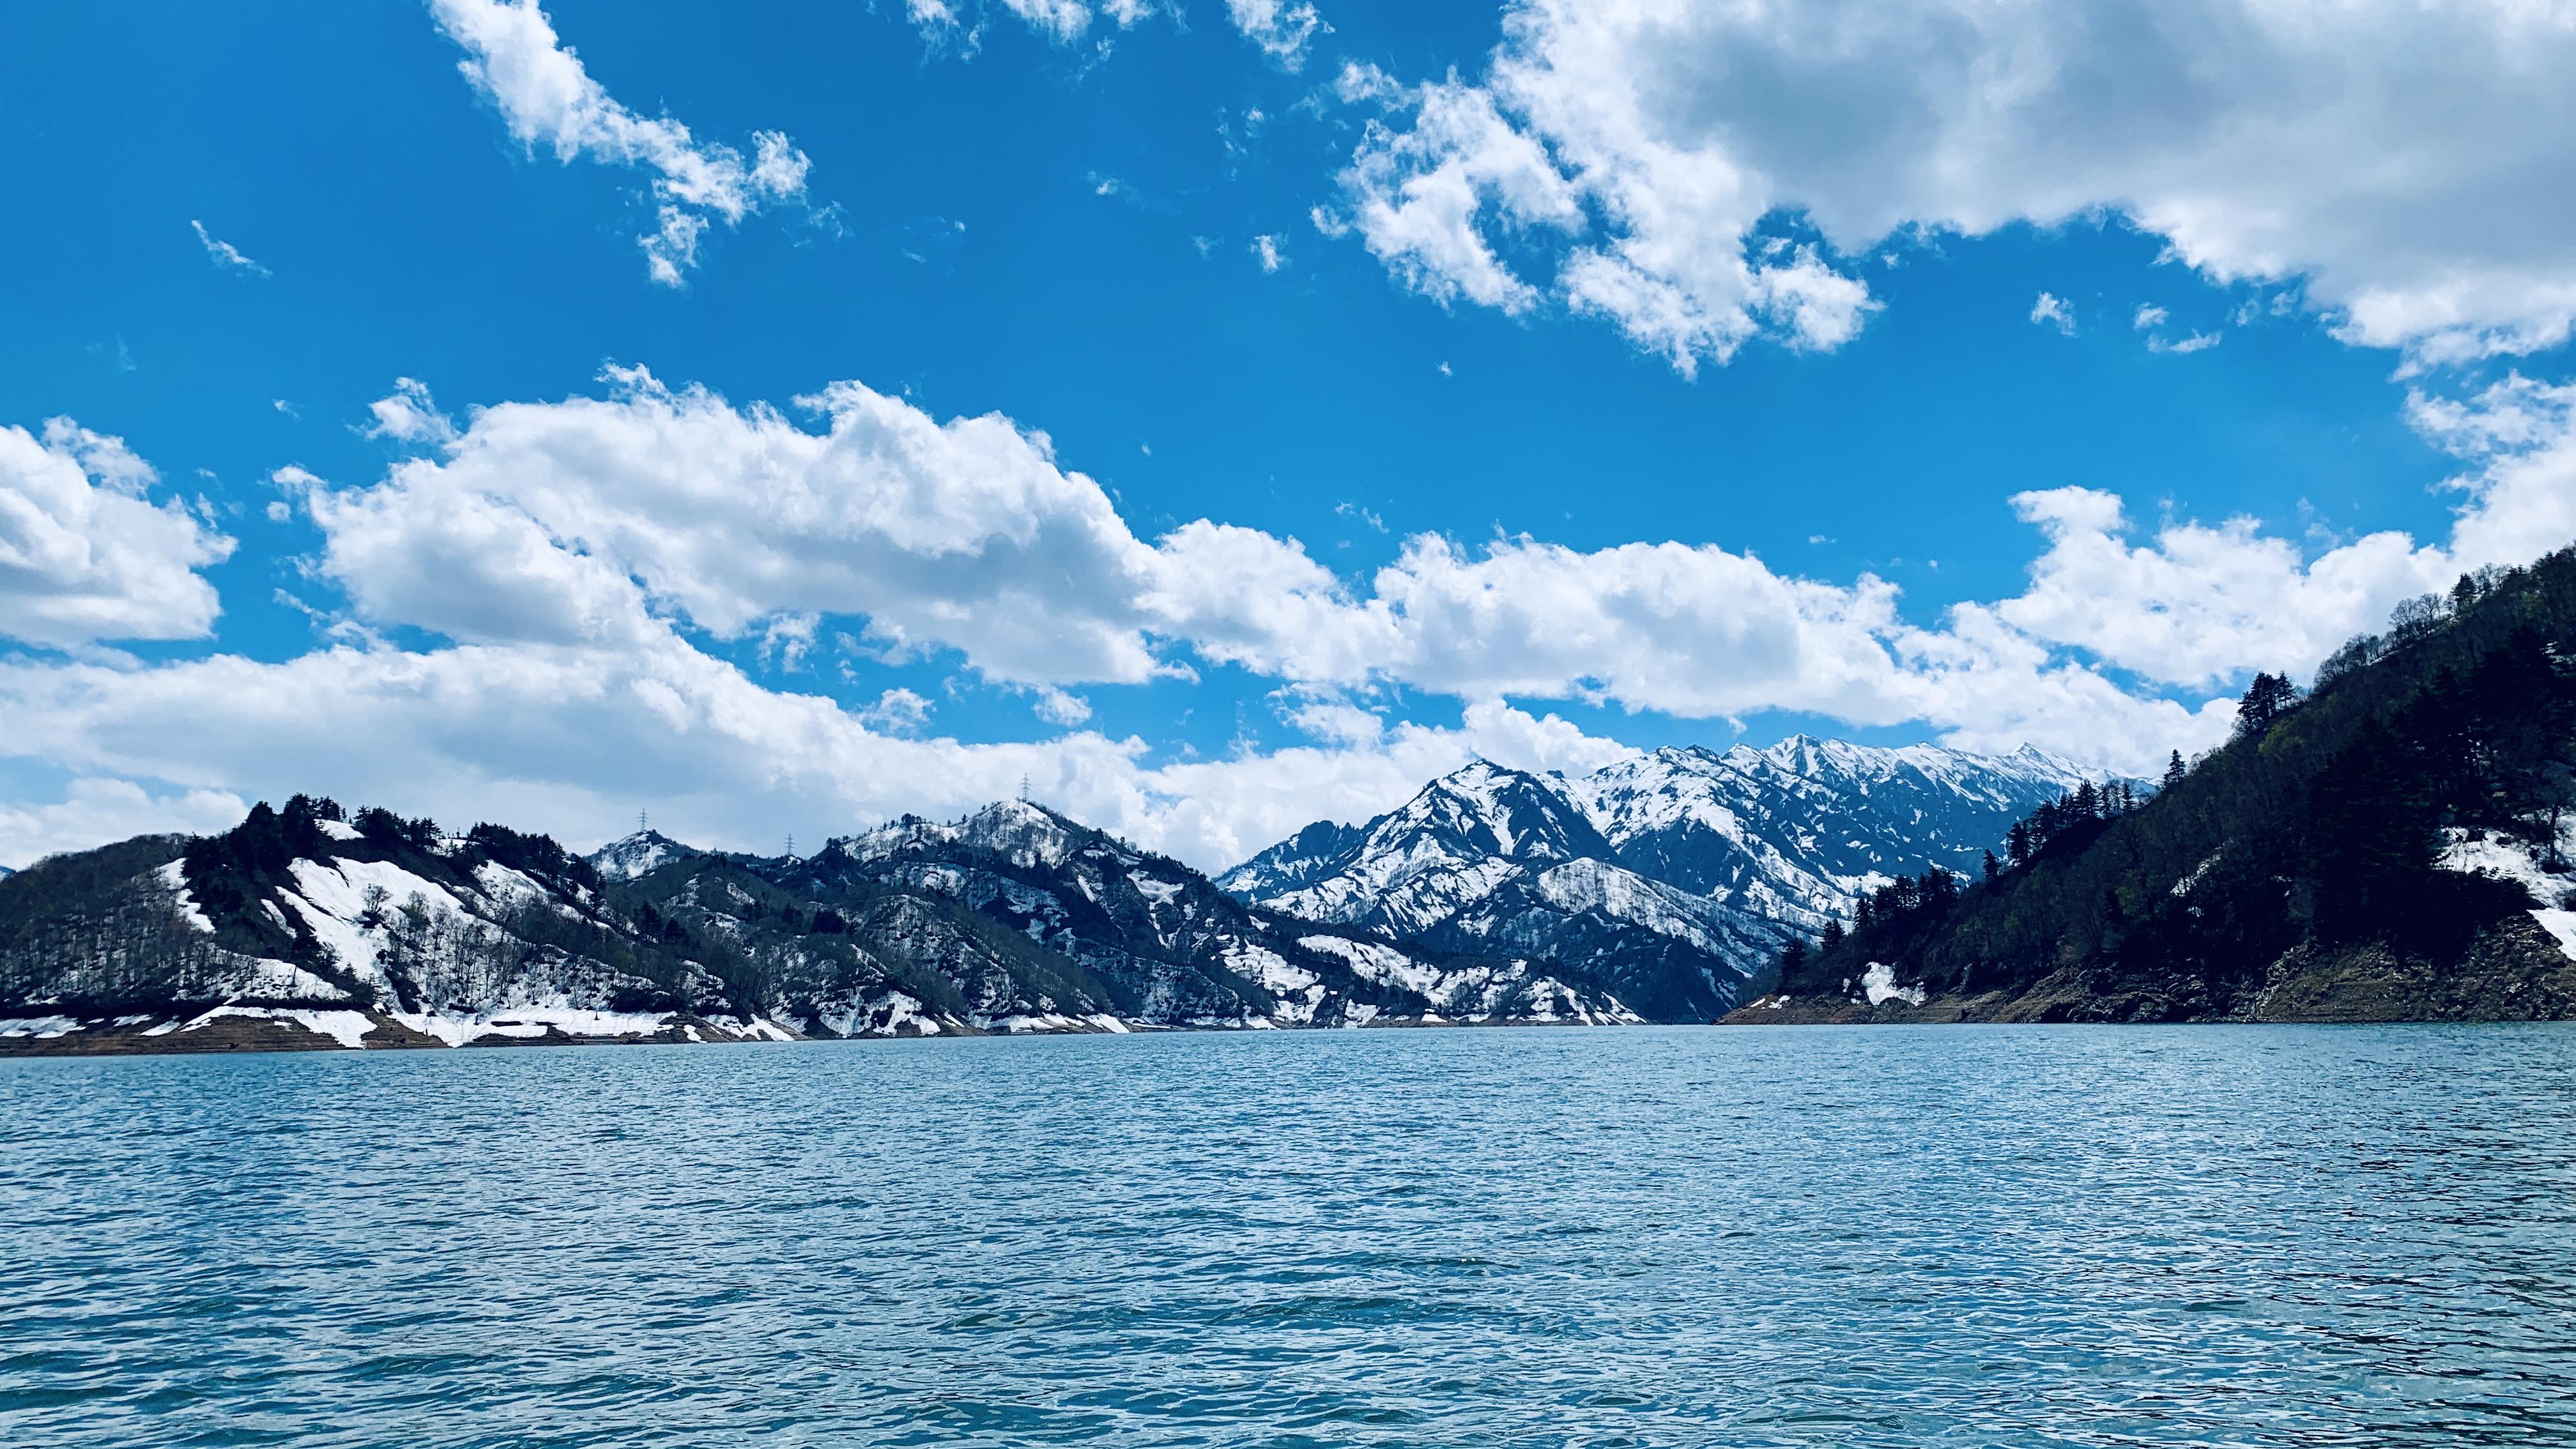 銀山湖5月